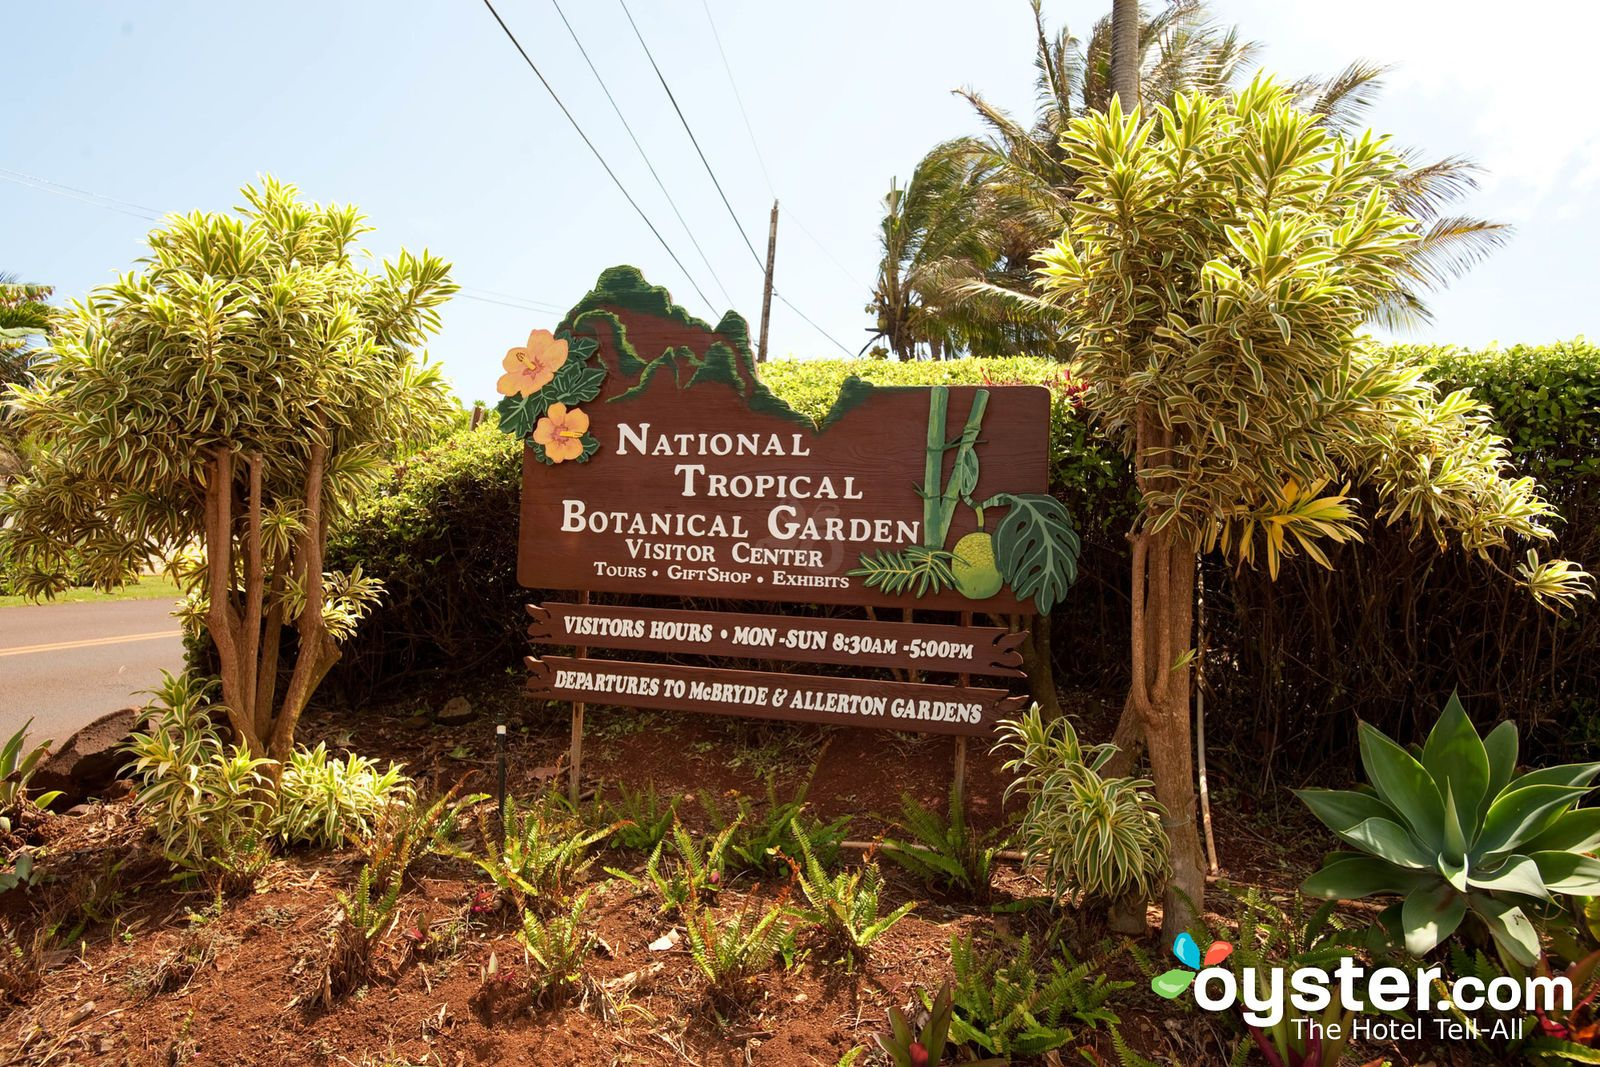 Genial Best In Botanical Garden Kauai | National Tropical Botanical Garden,  Kalaheo, Kauai, Hawaii